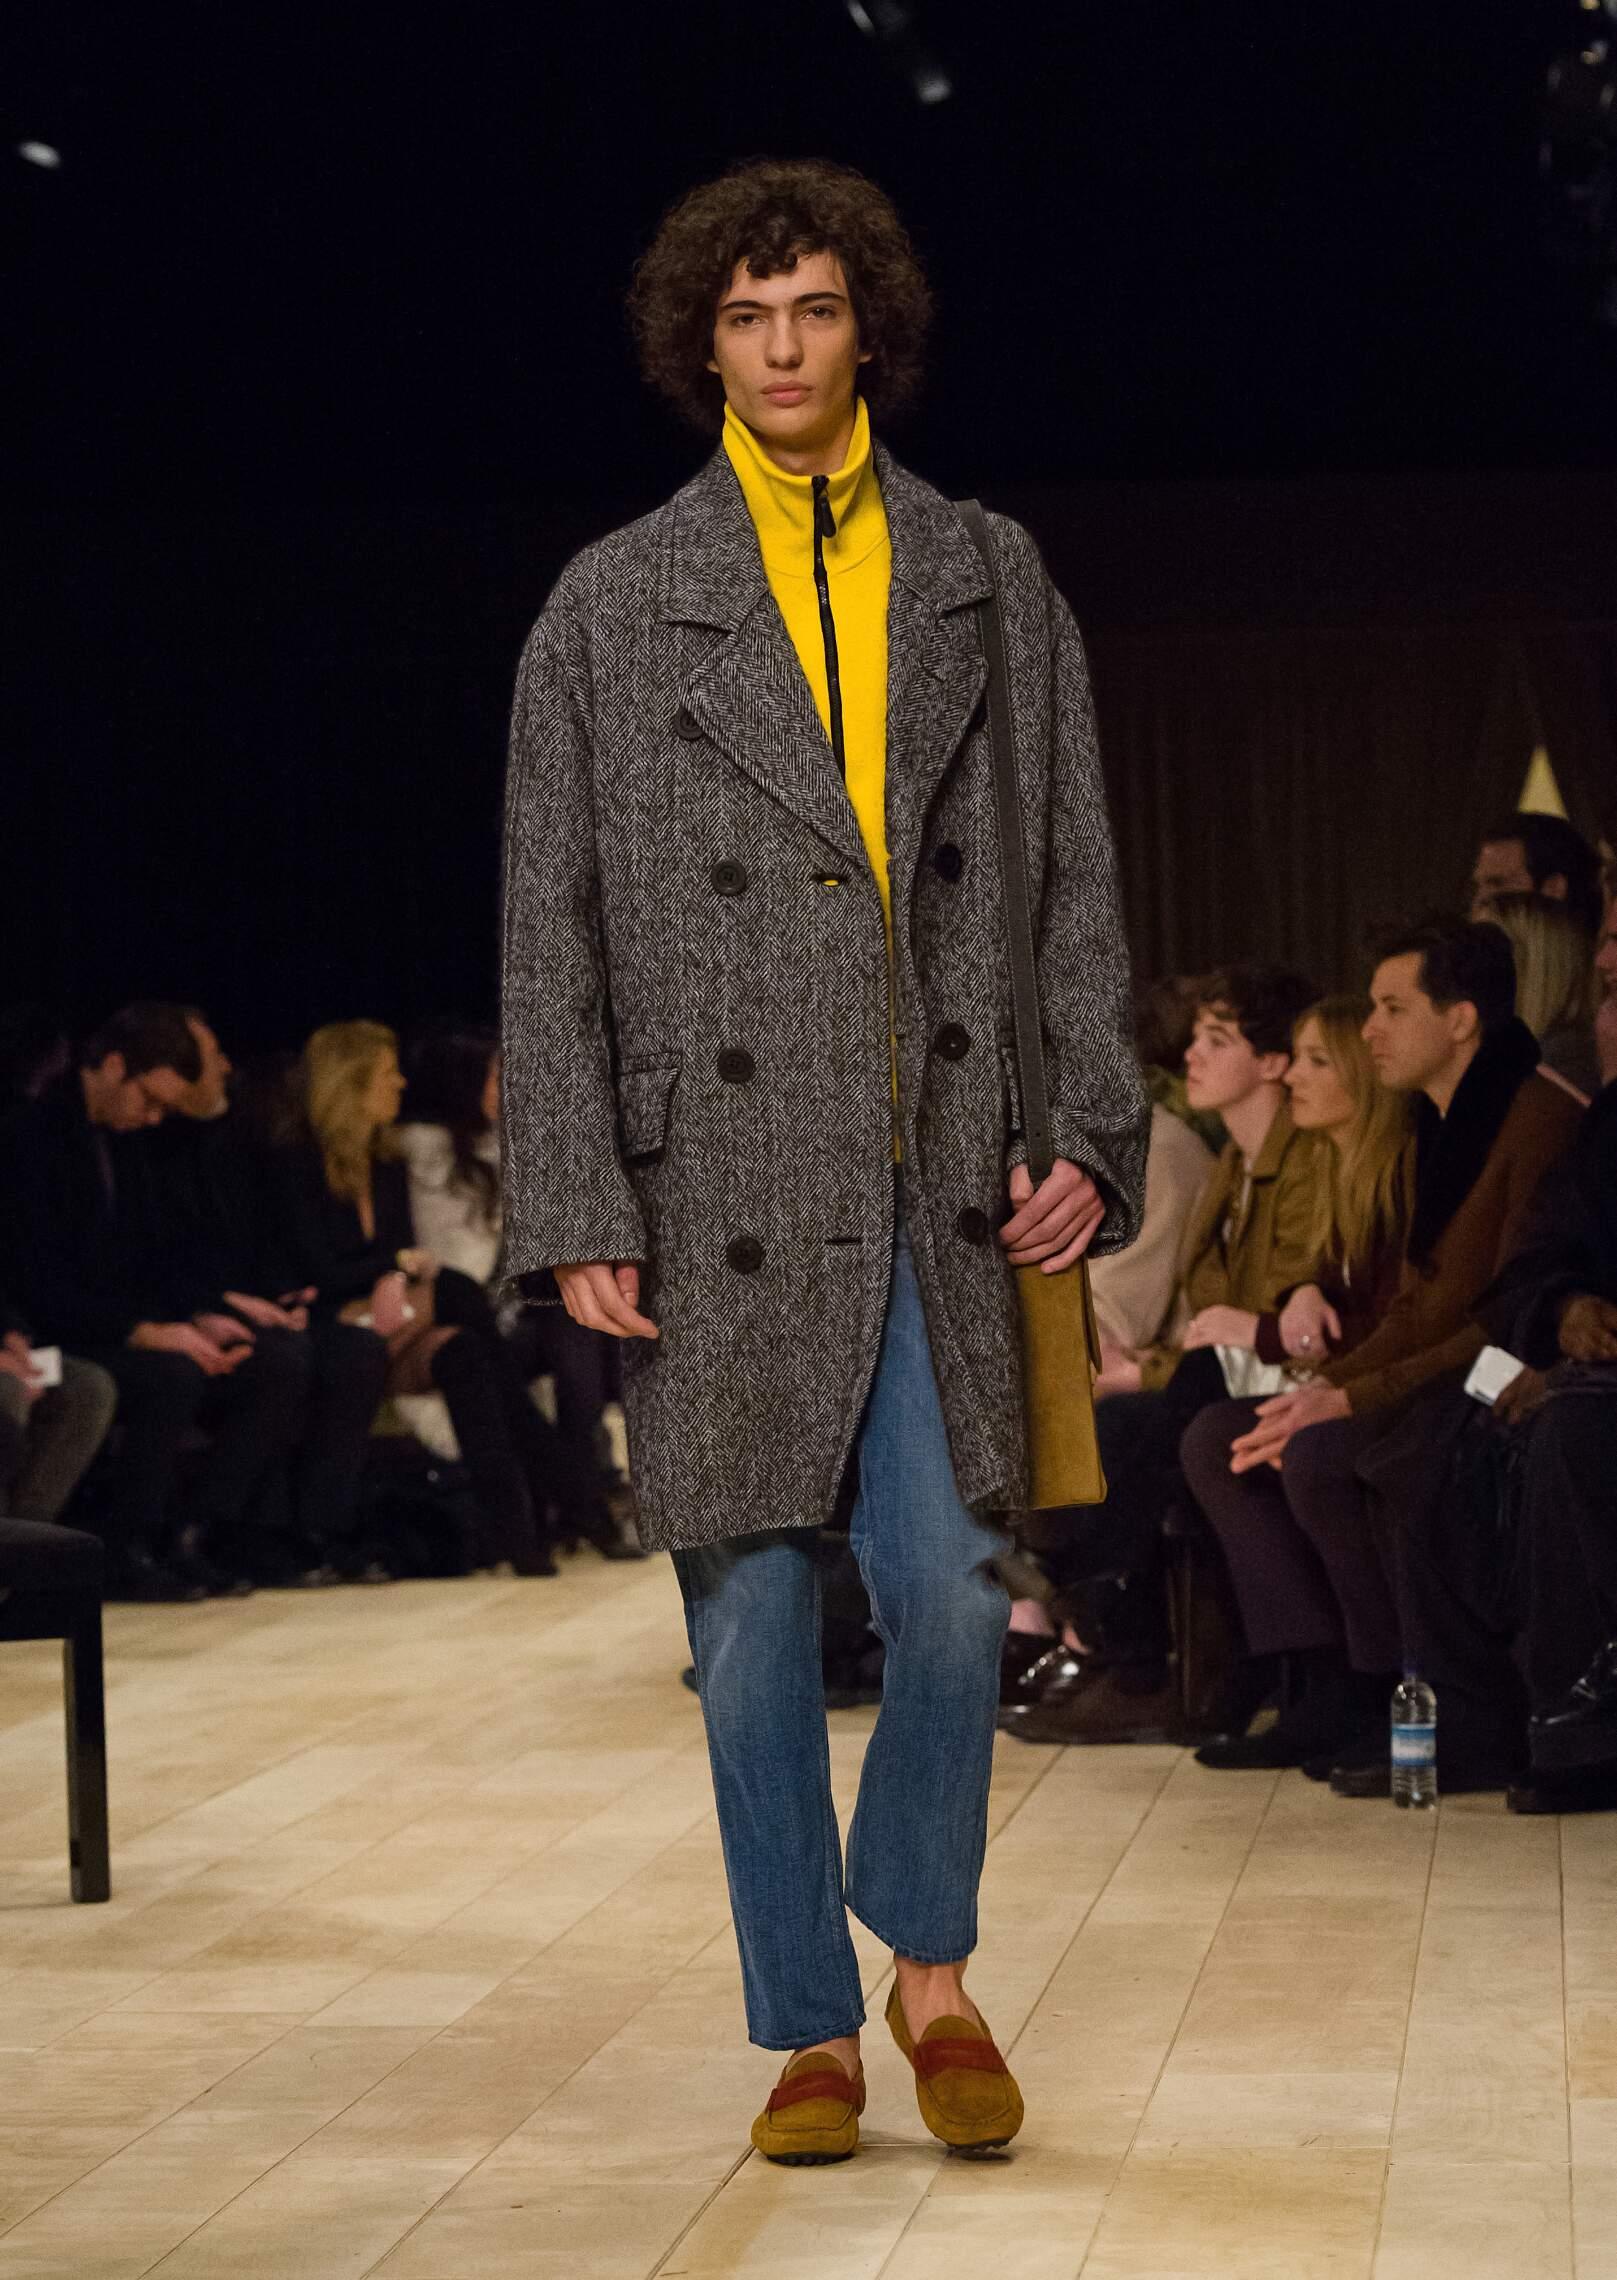 2016 Catwalk Burberry Man Fashion Show Winter